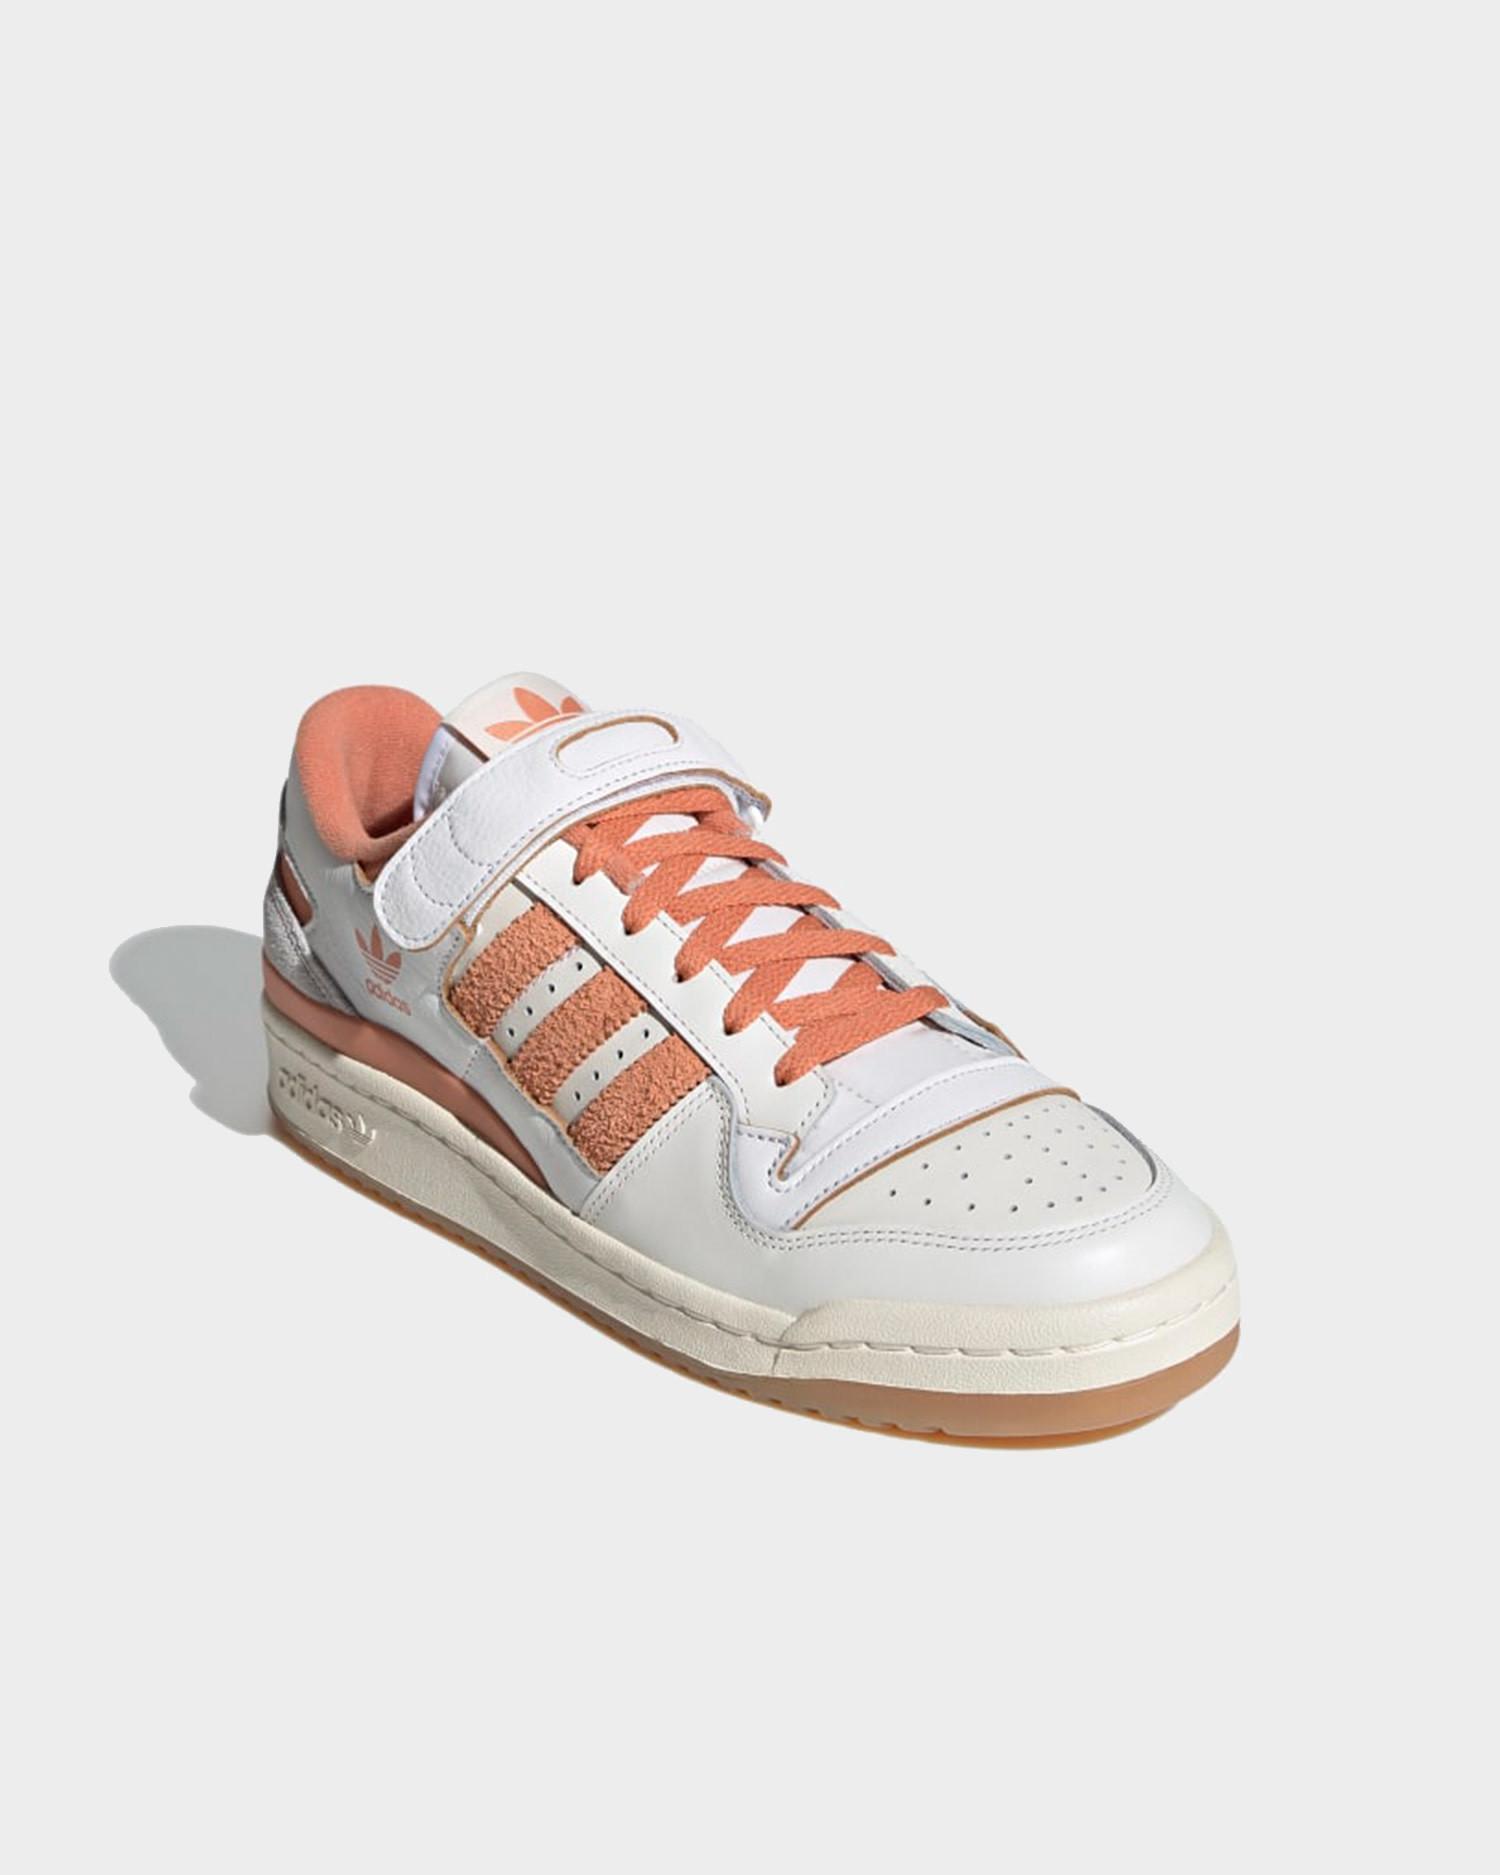 Adidas Forum 84 Low Ftwwht/HazCop/Blacre